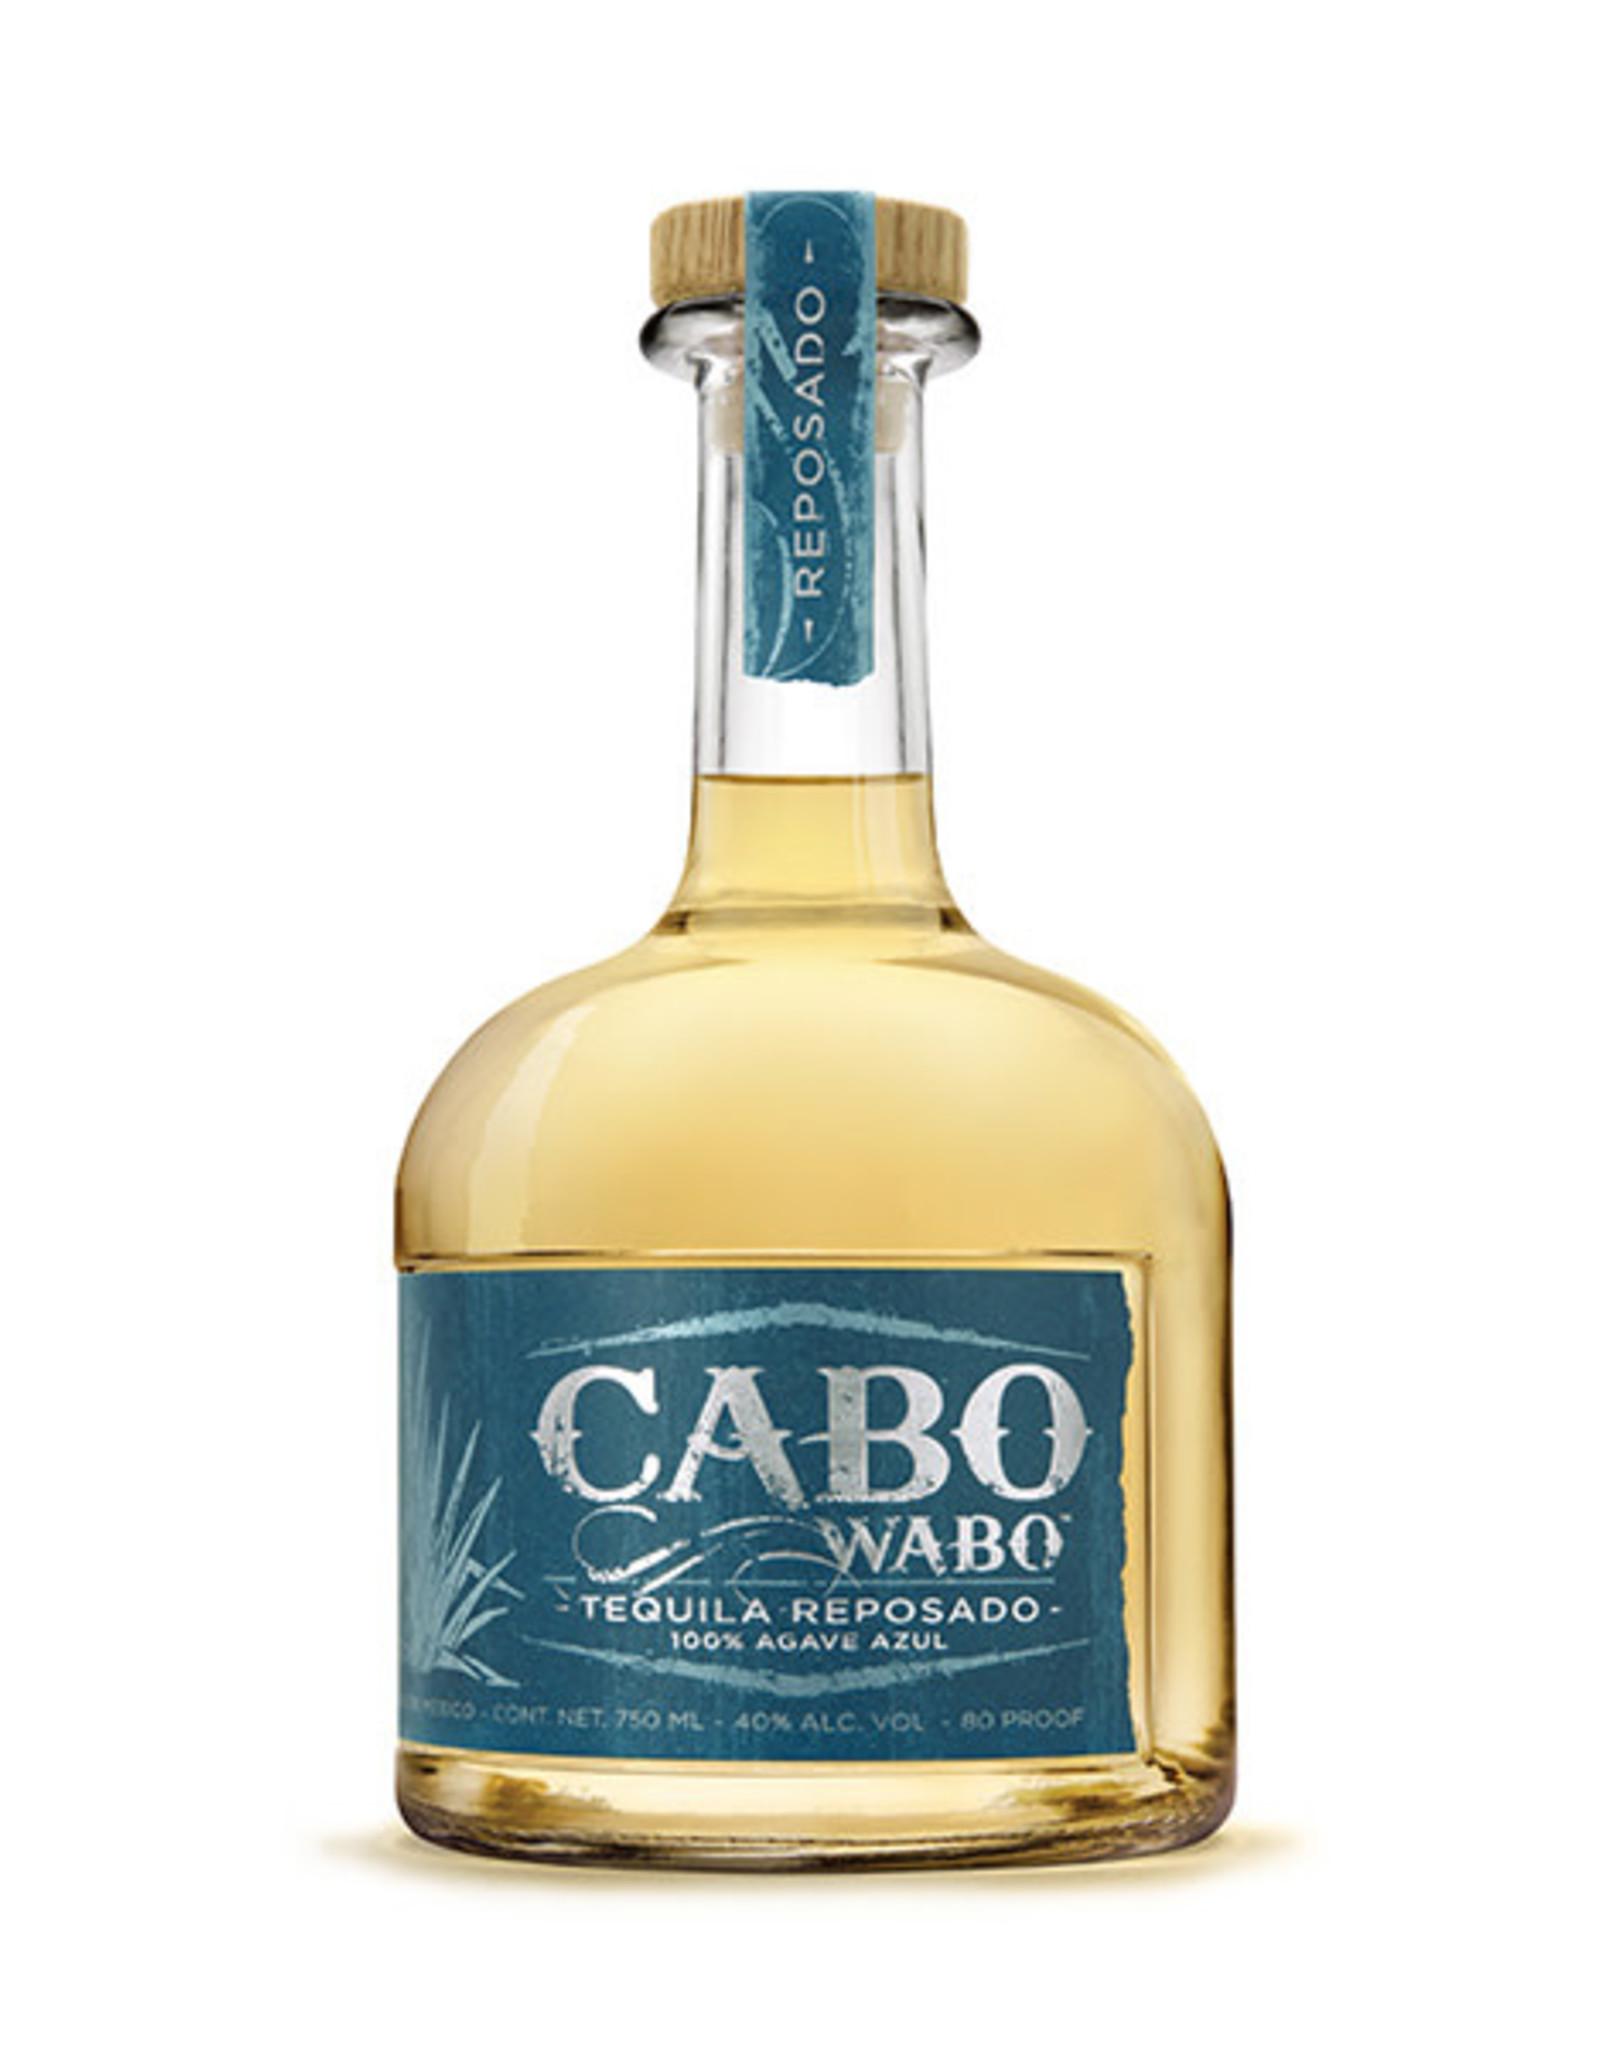 Cabo Wabo Cabo Wabo Tequila Reposado 750ML